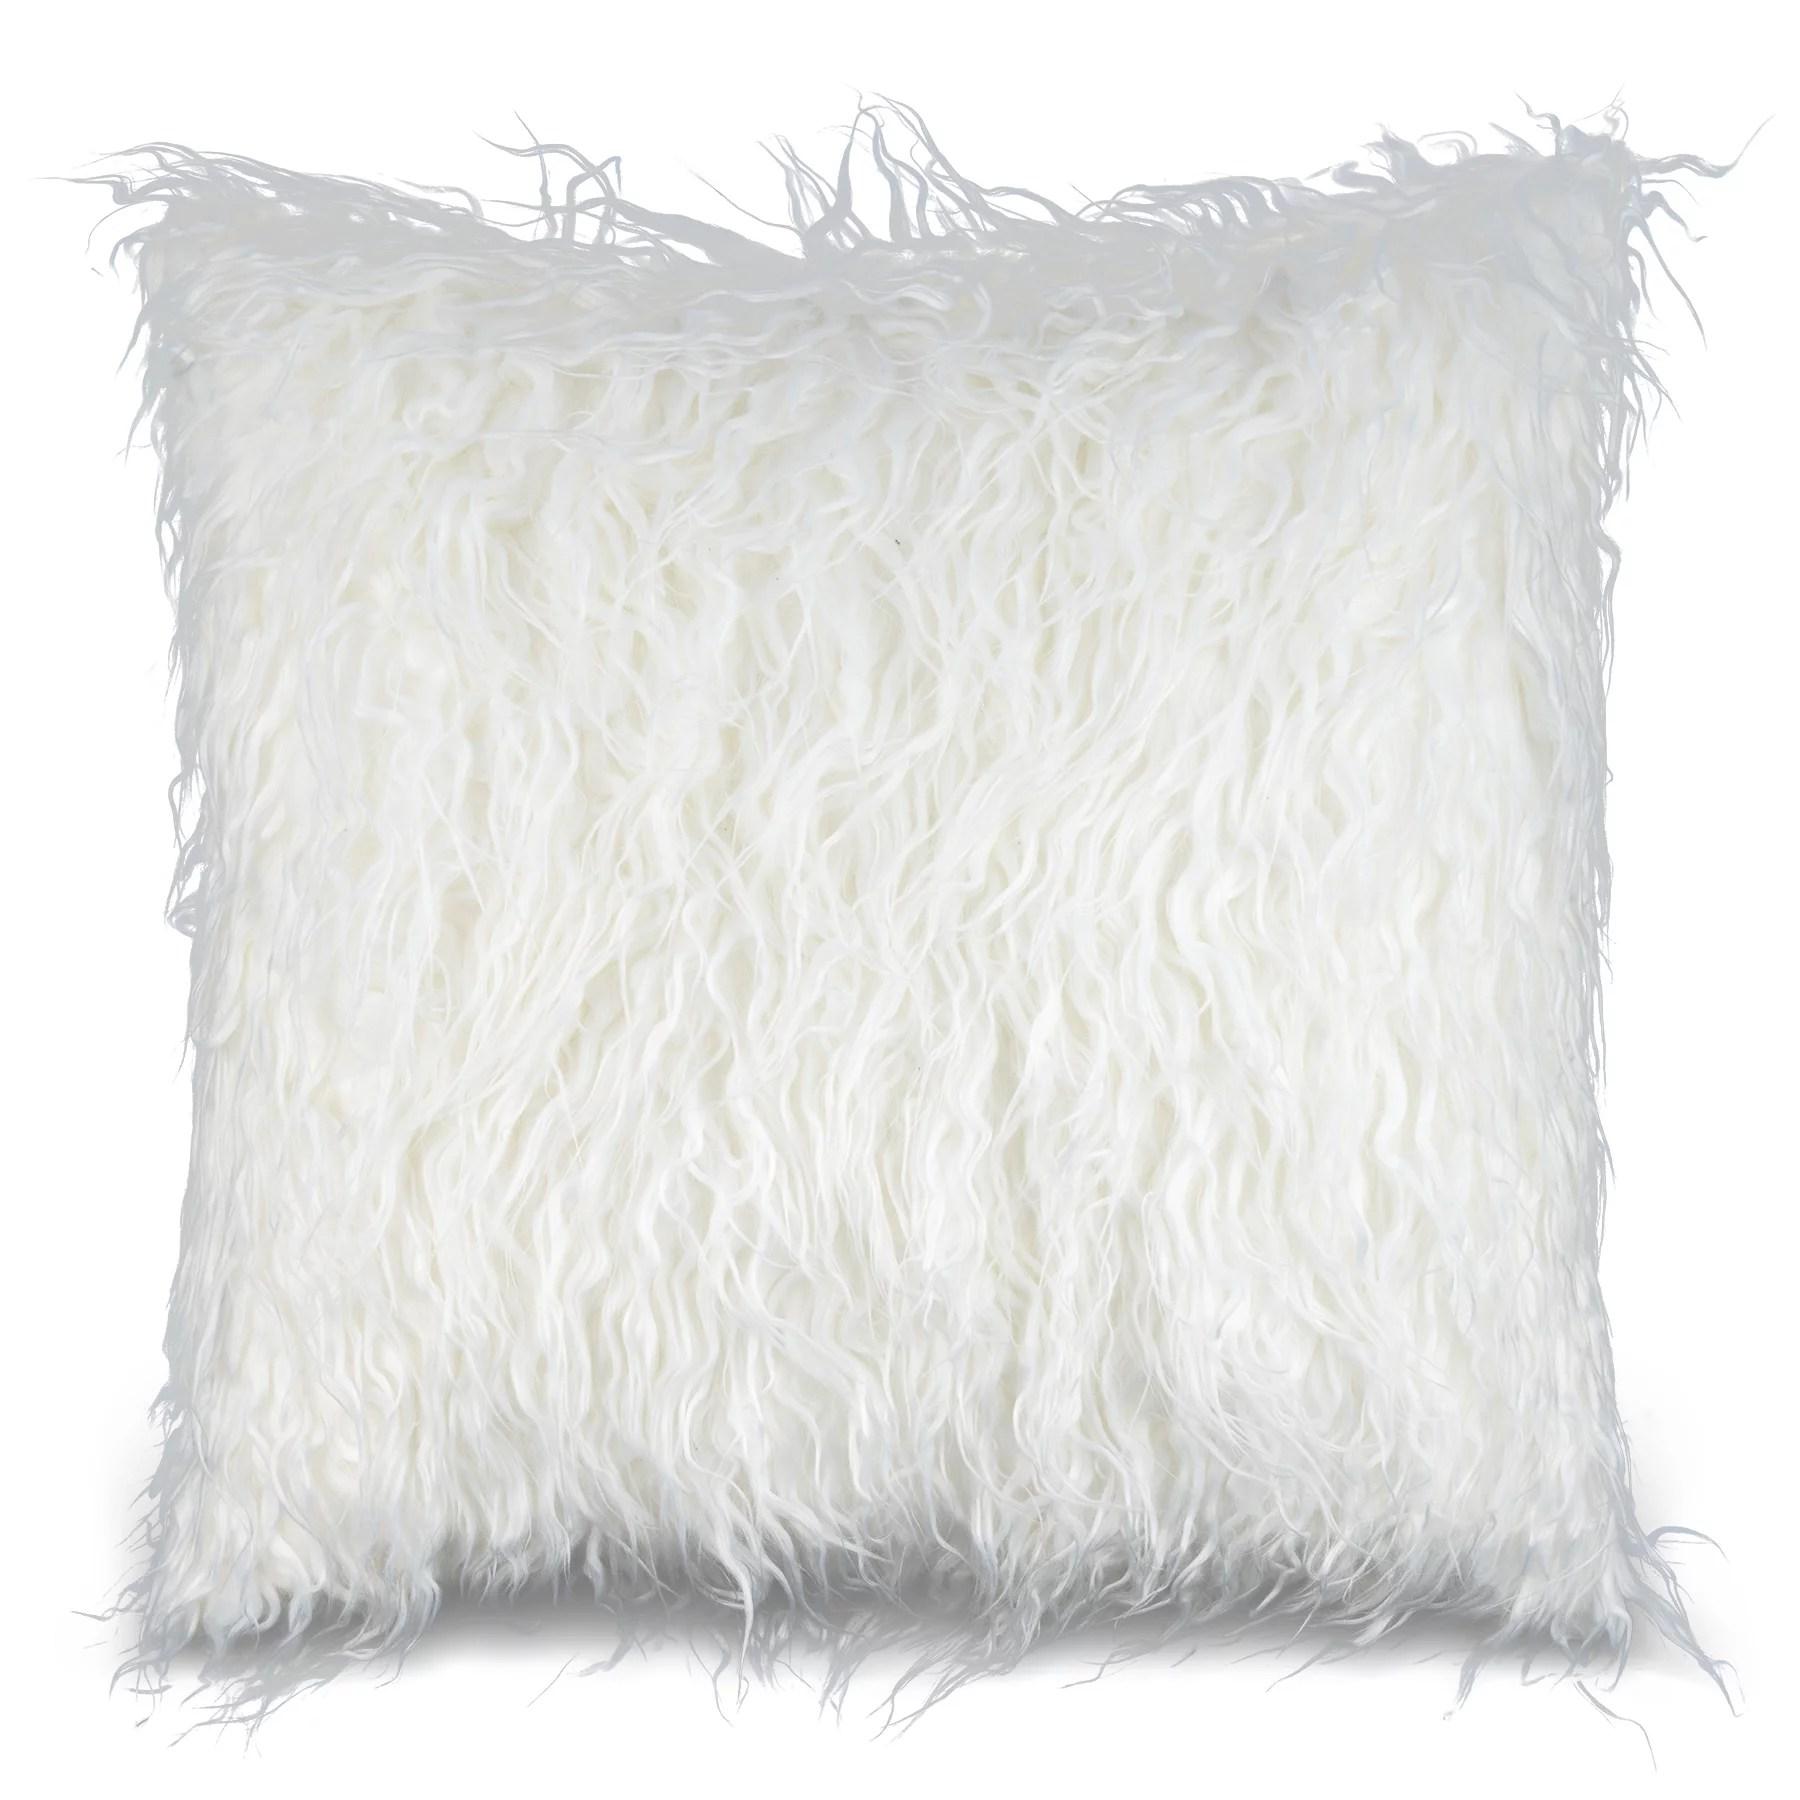 mauby home decorative pillows mongolian faux fur pillow throw pillows 18 x 18 square white